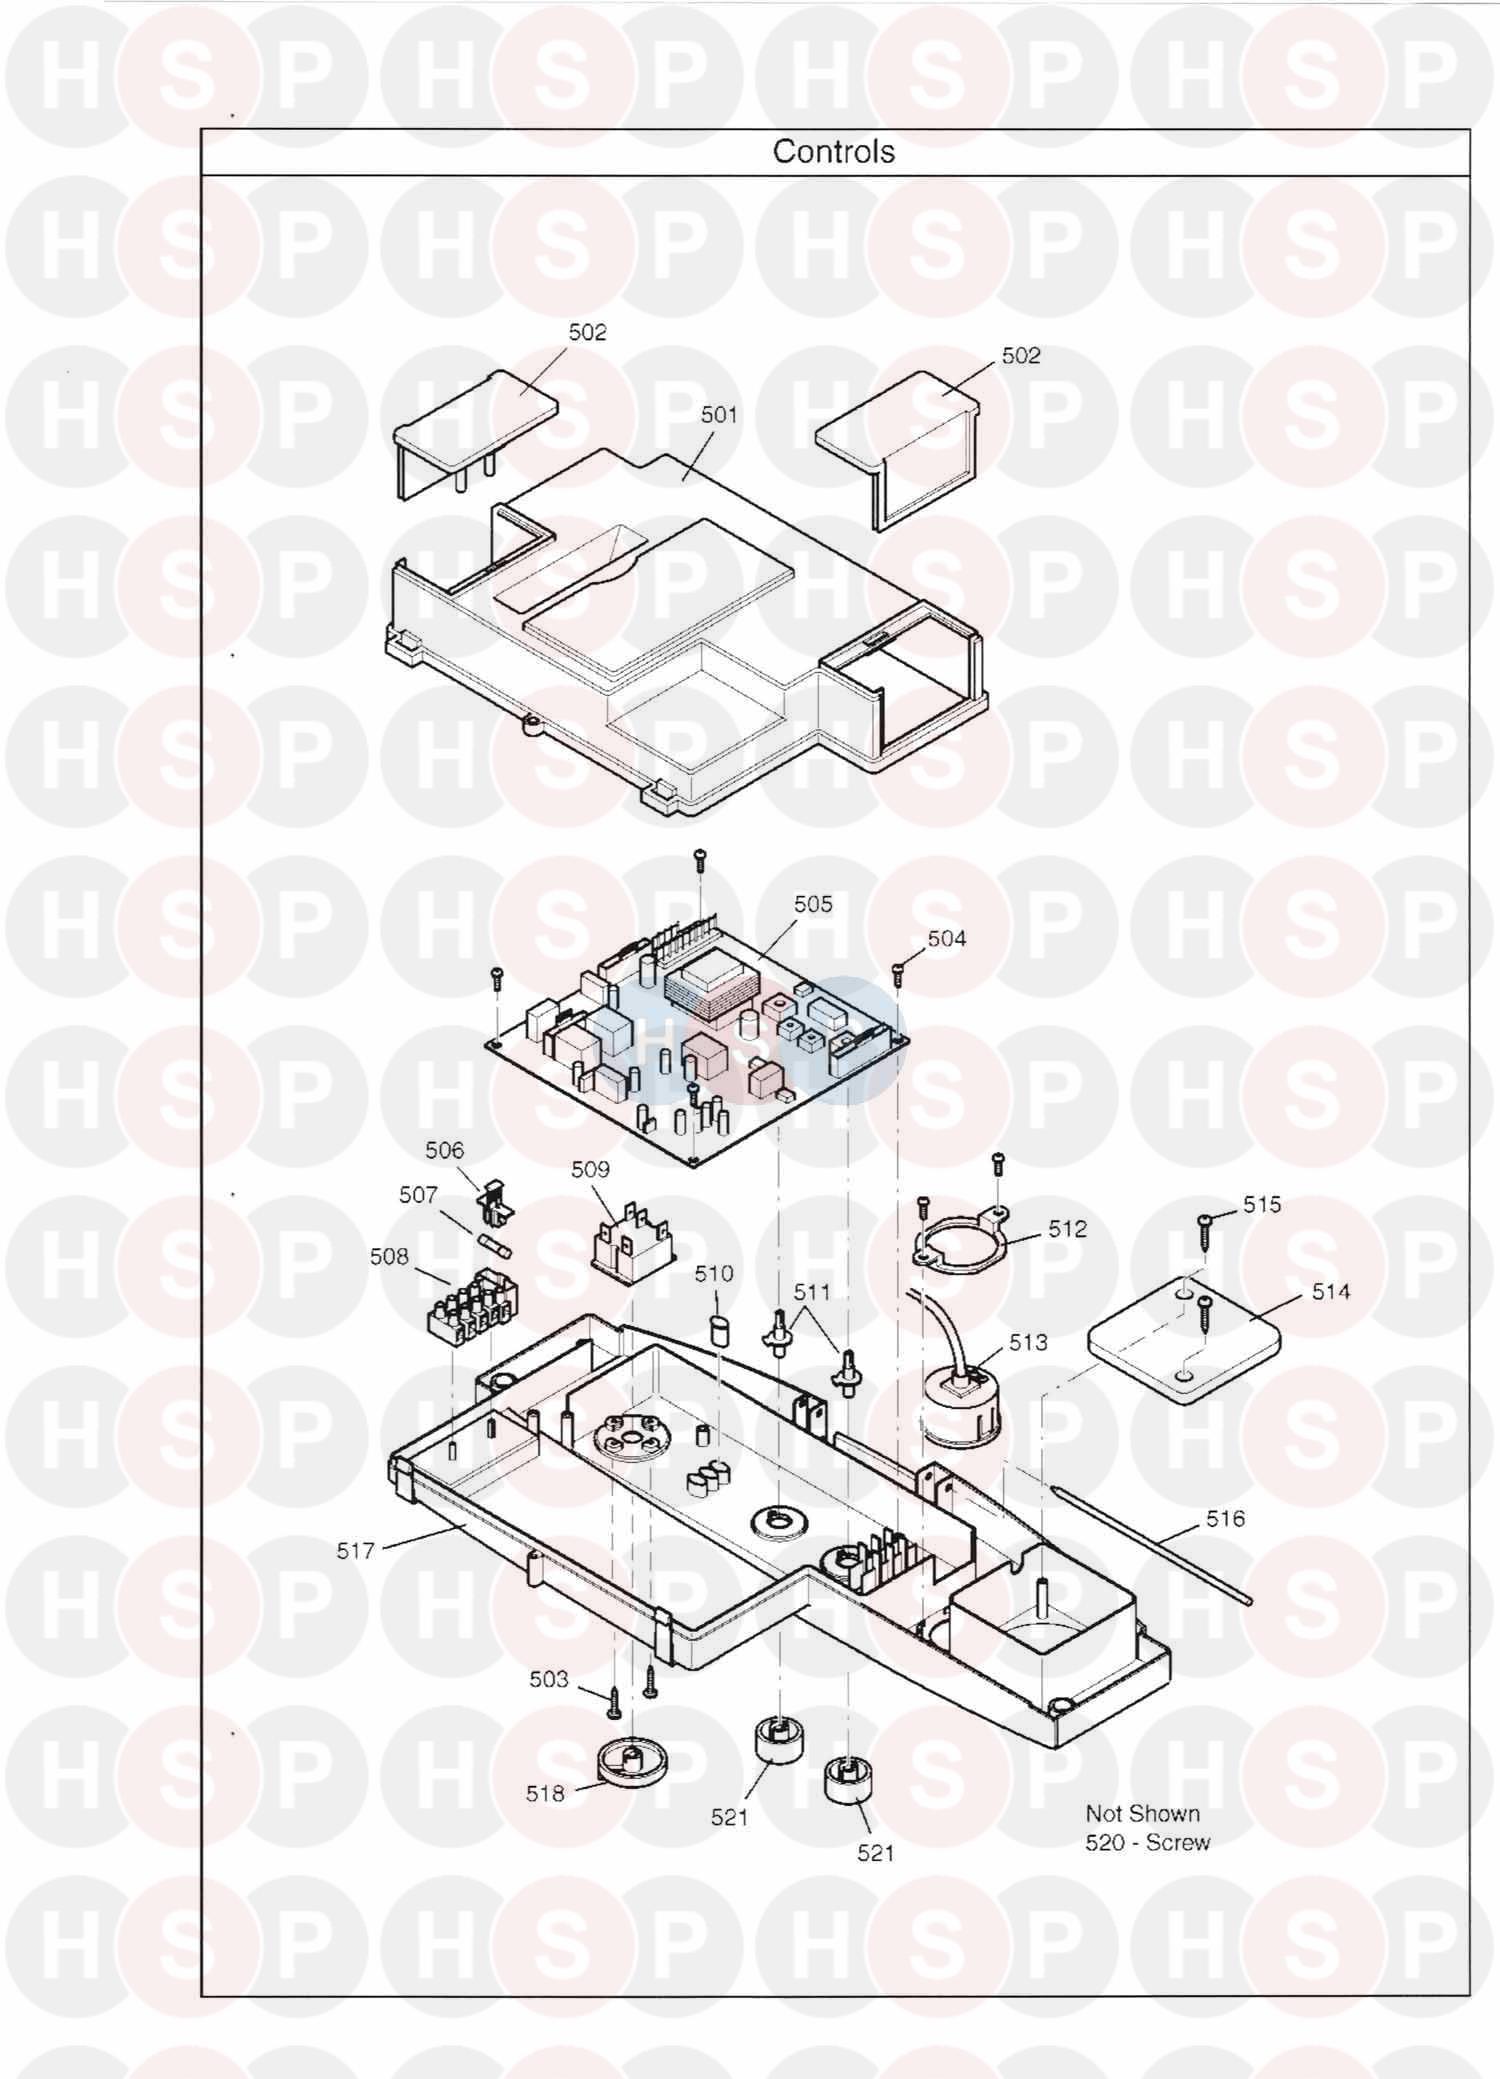 main combi 30he  controls  diagram